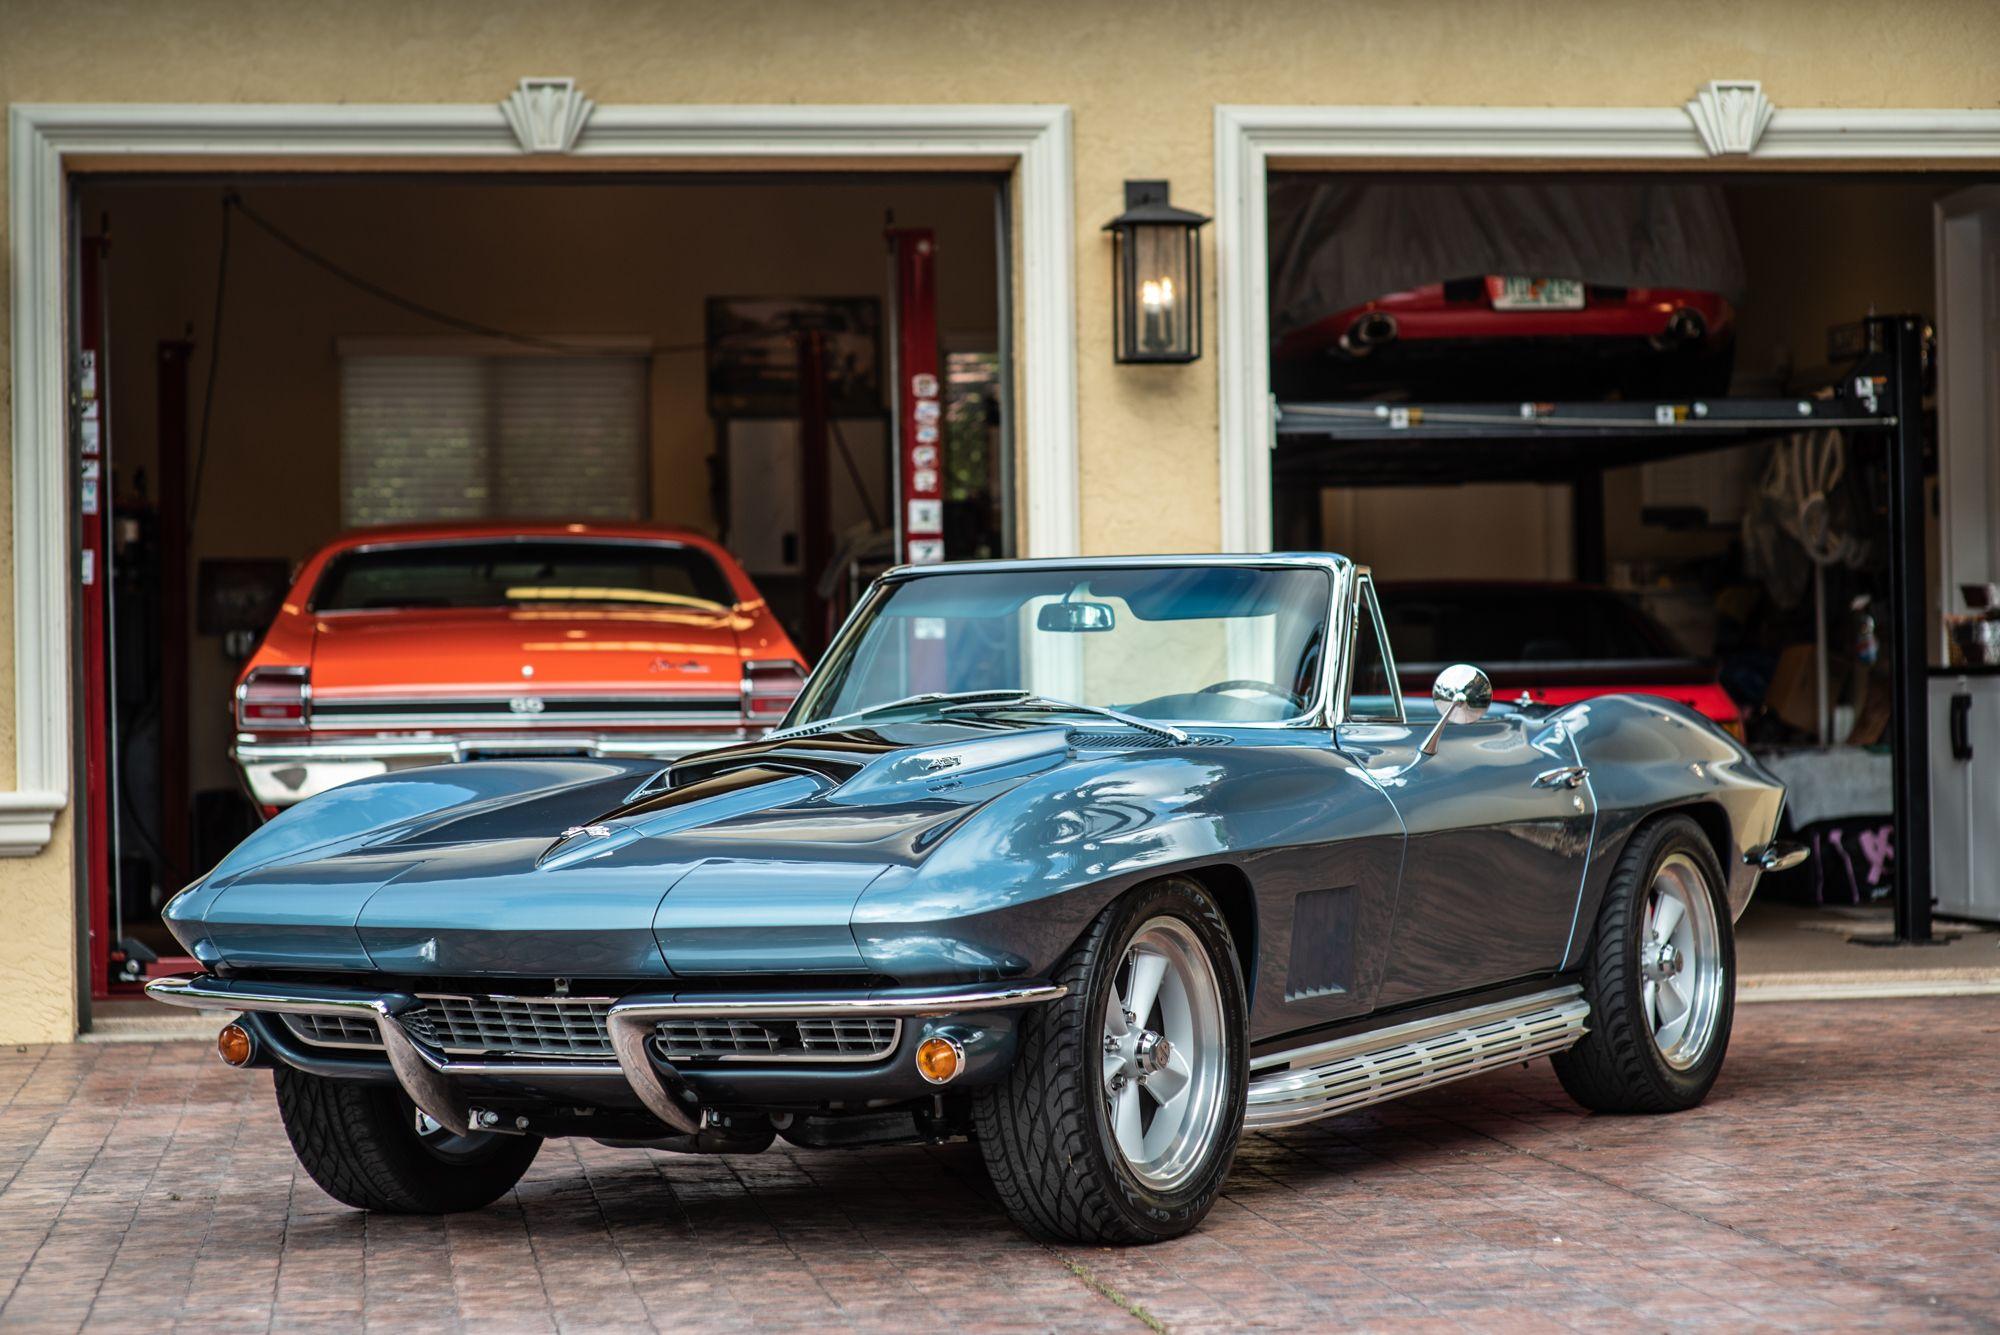 1967 Chevrolet Corvette L88 Tribute